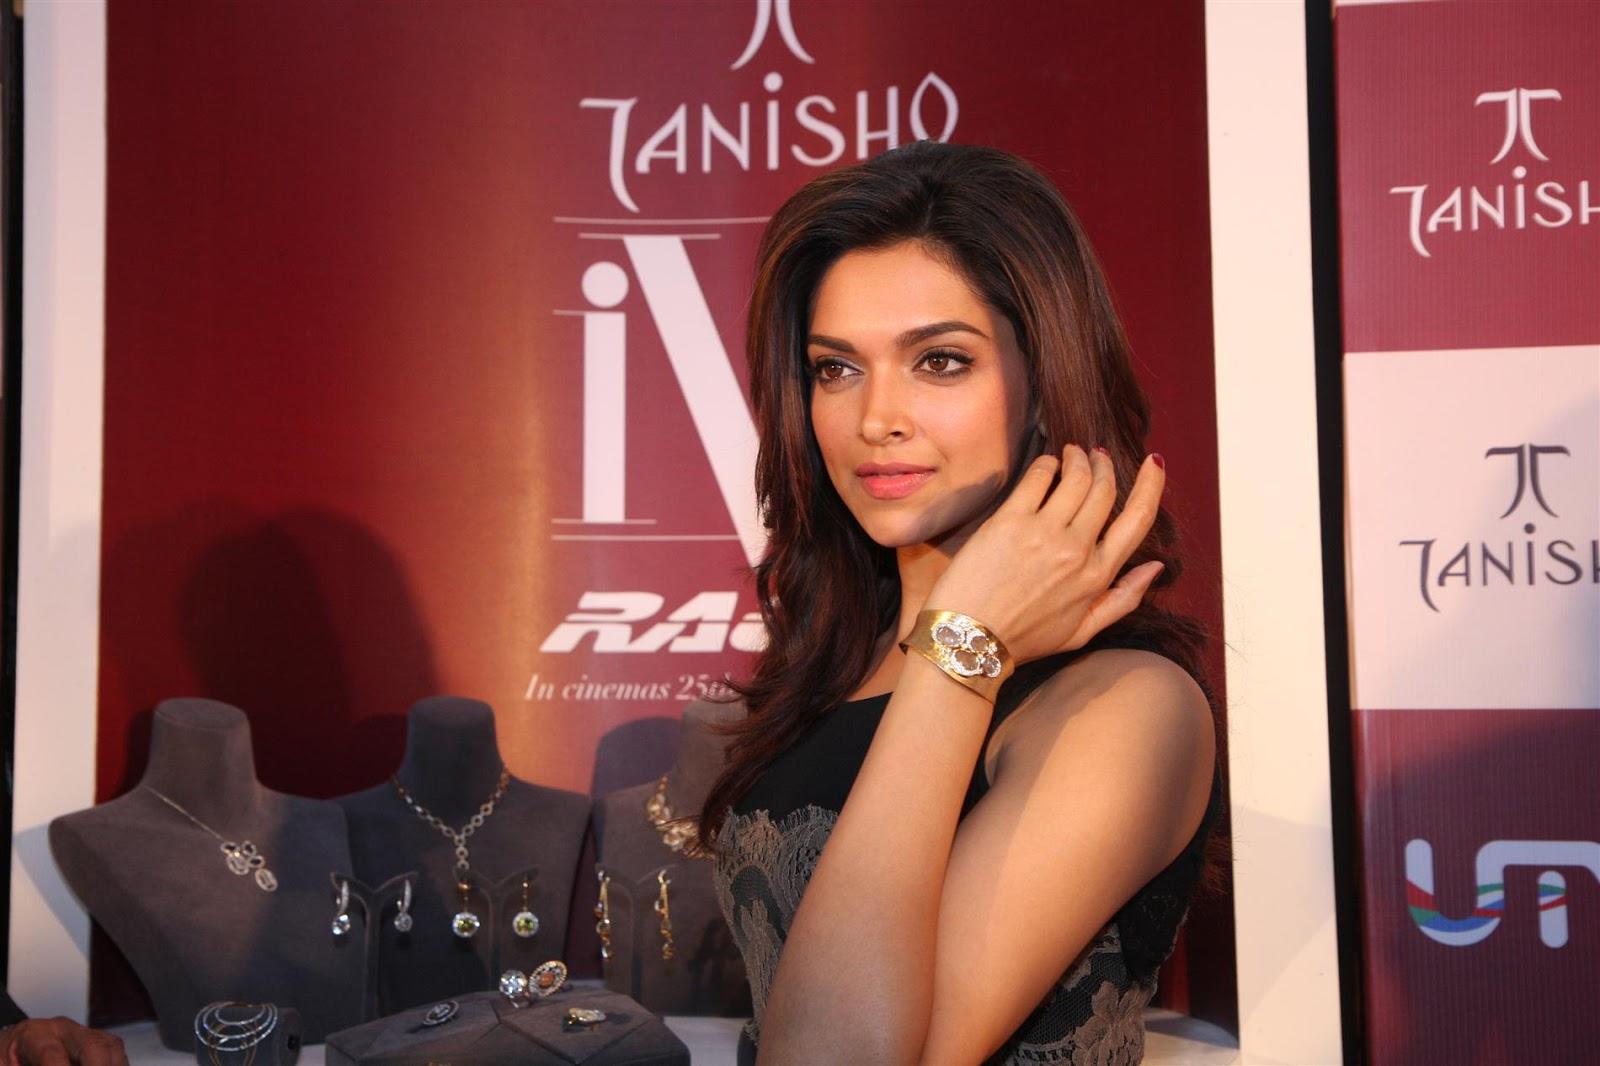 Indian Glamorous Dimple Queen Deepika Padukone Hot Photos In Long Black Dress